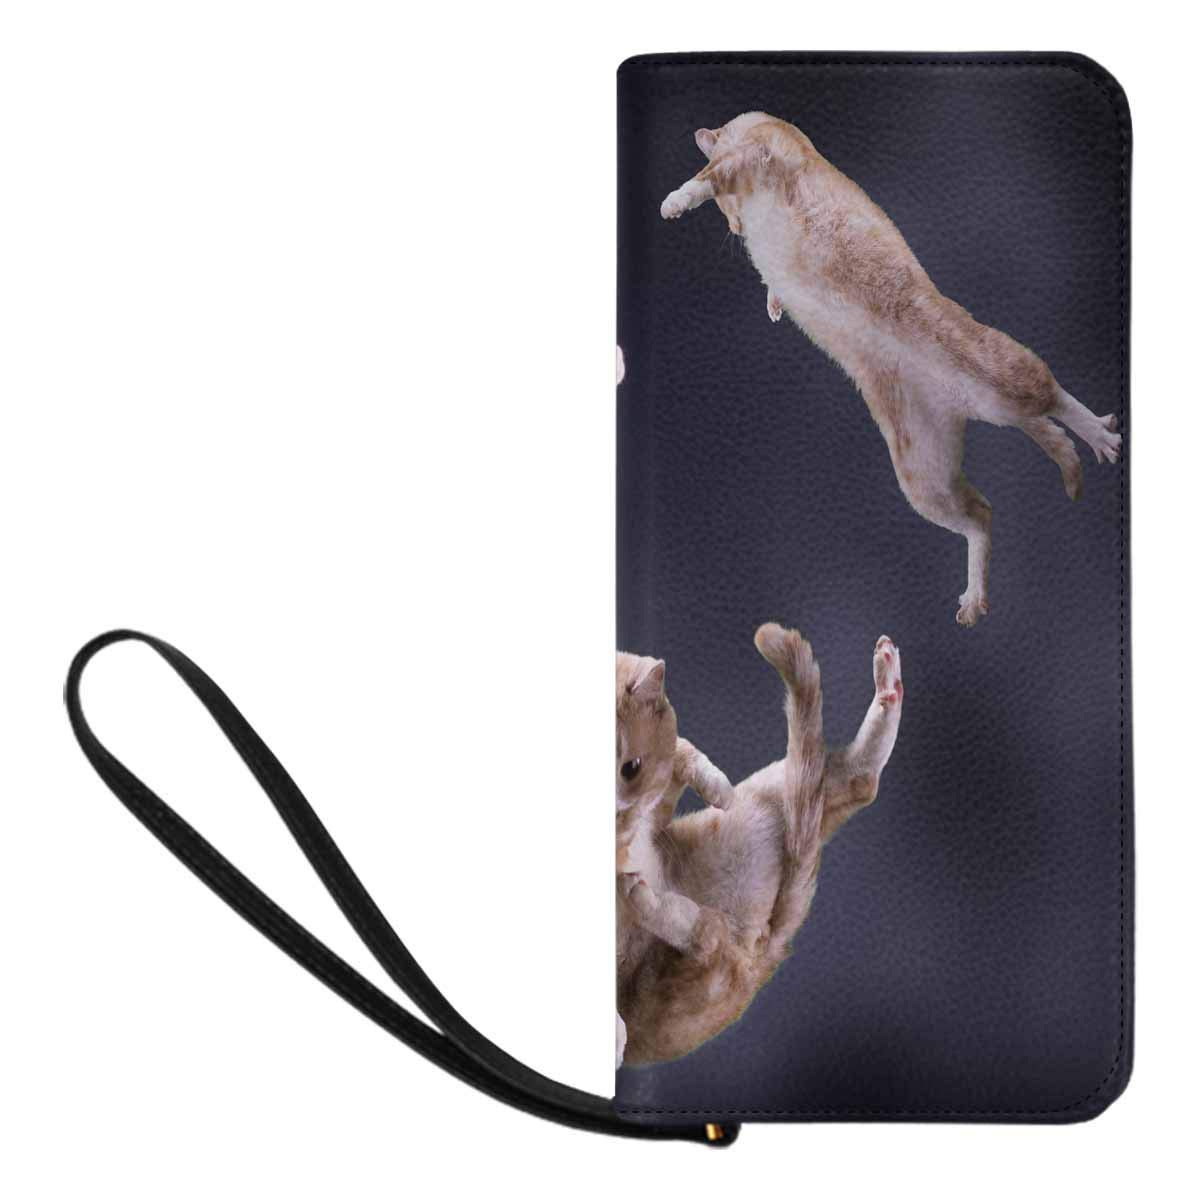 InterestPrint Womens Three Cats Jumping in Spac Clutch Purse Card Holder Organizer Ladies Purse